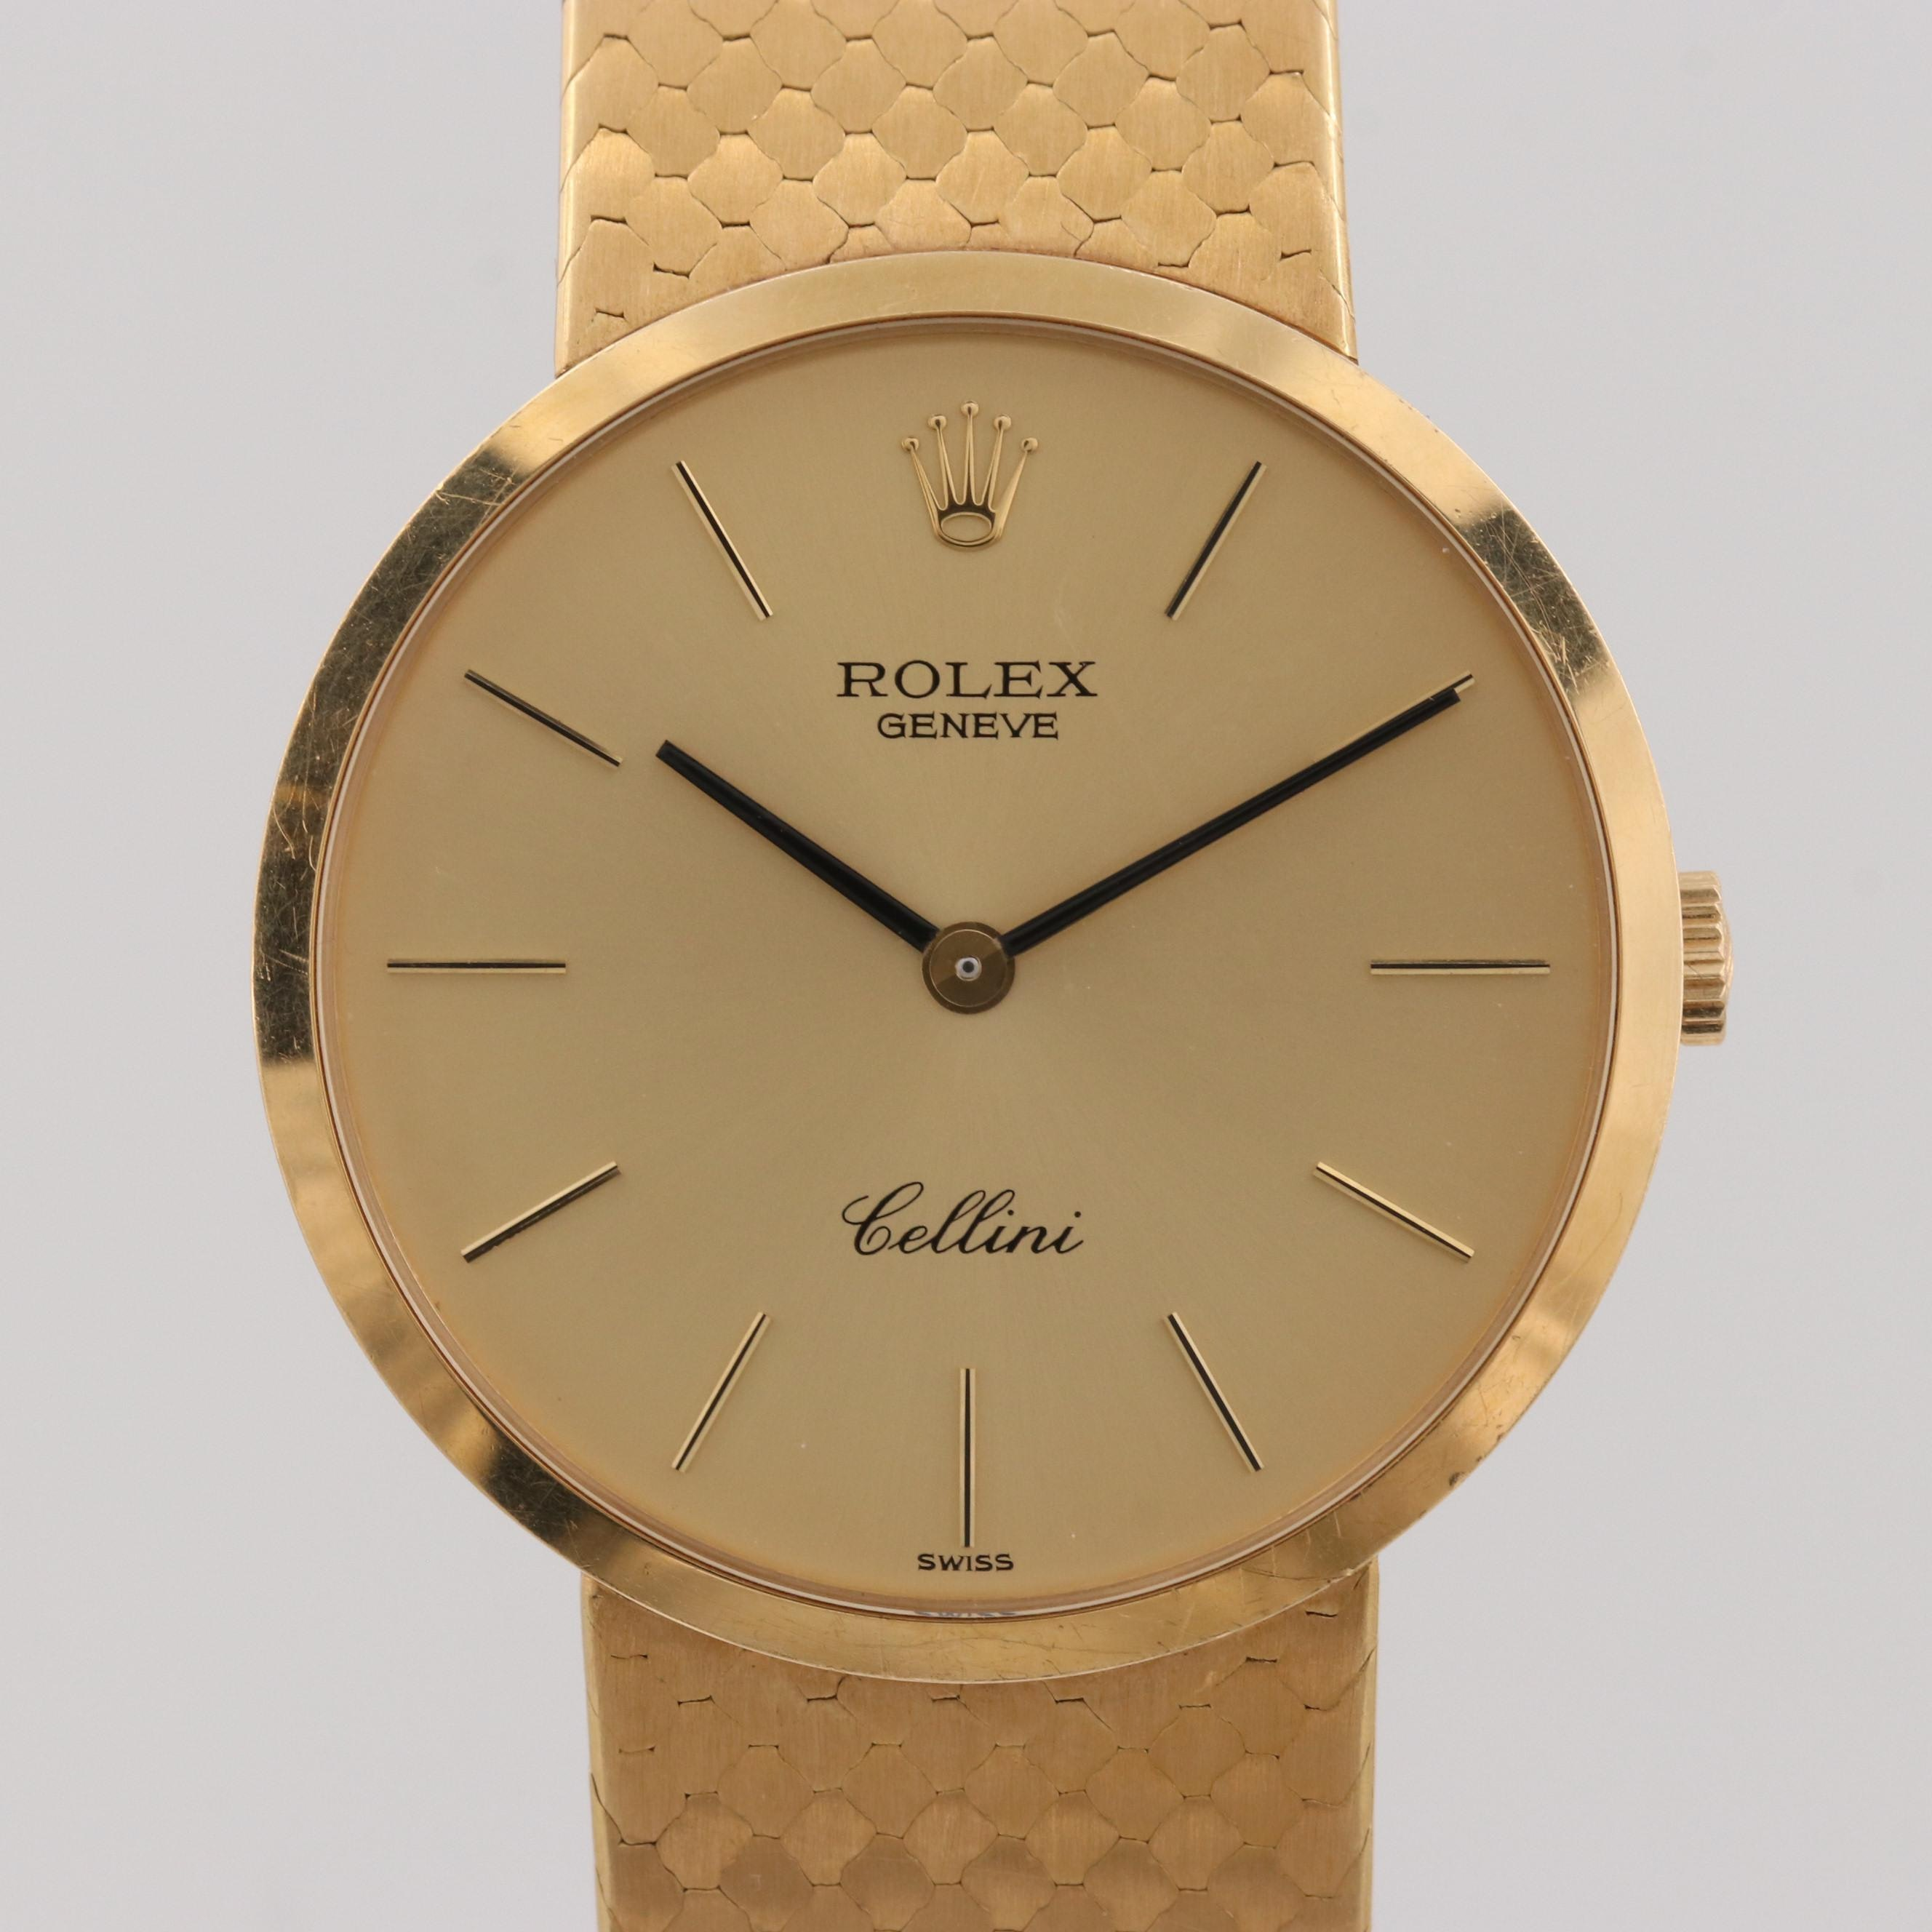 Vintage Rolex Cellini 18k Yellow Gold Stem Wind Wristwatch, 1976